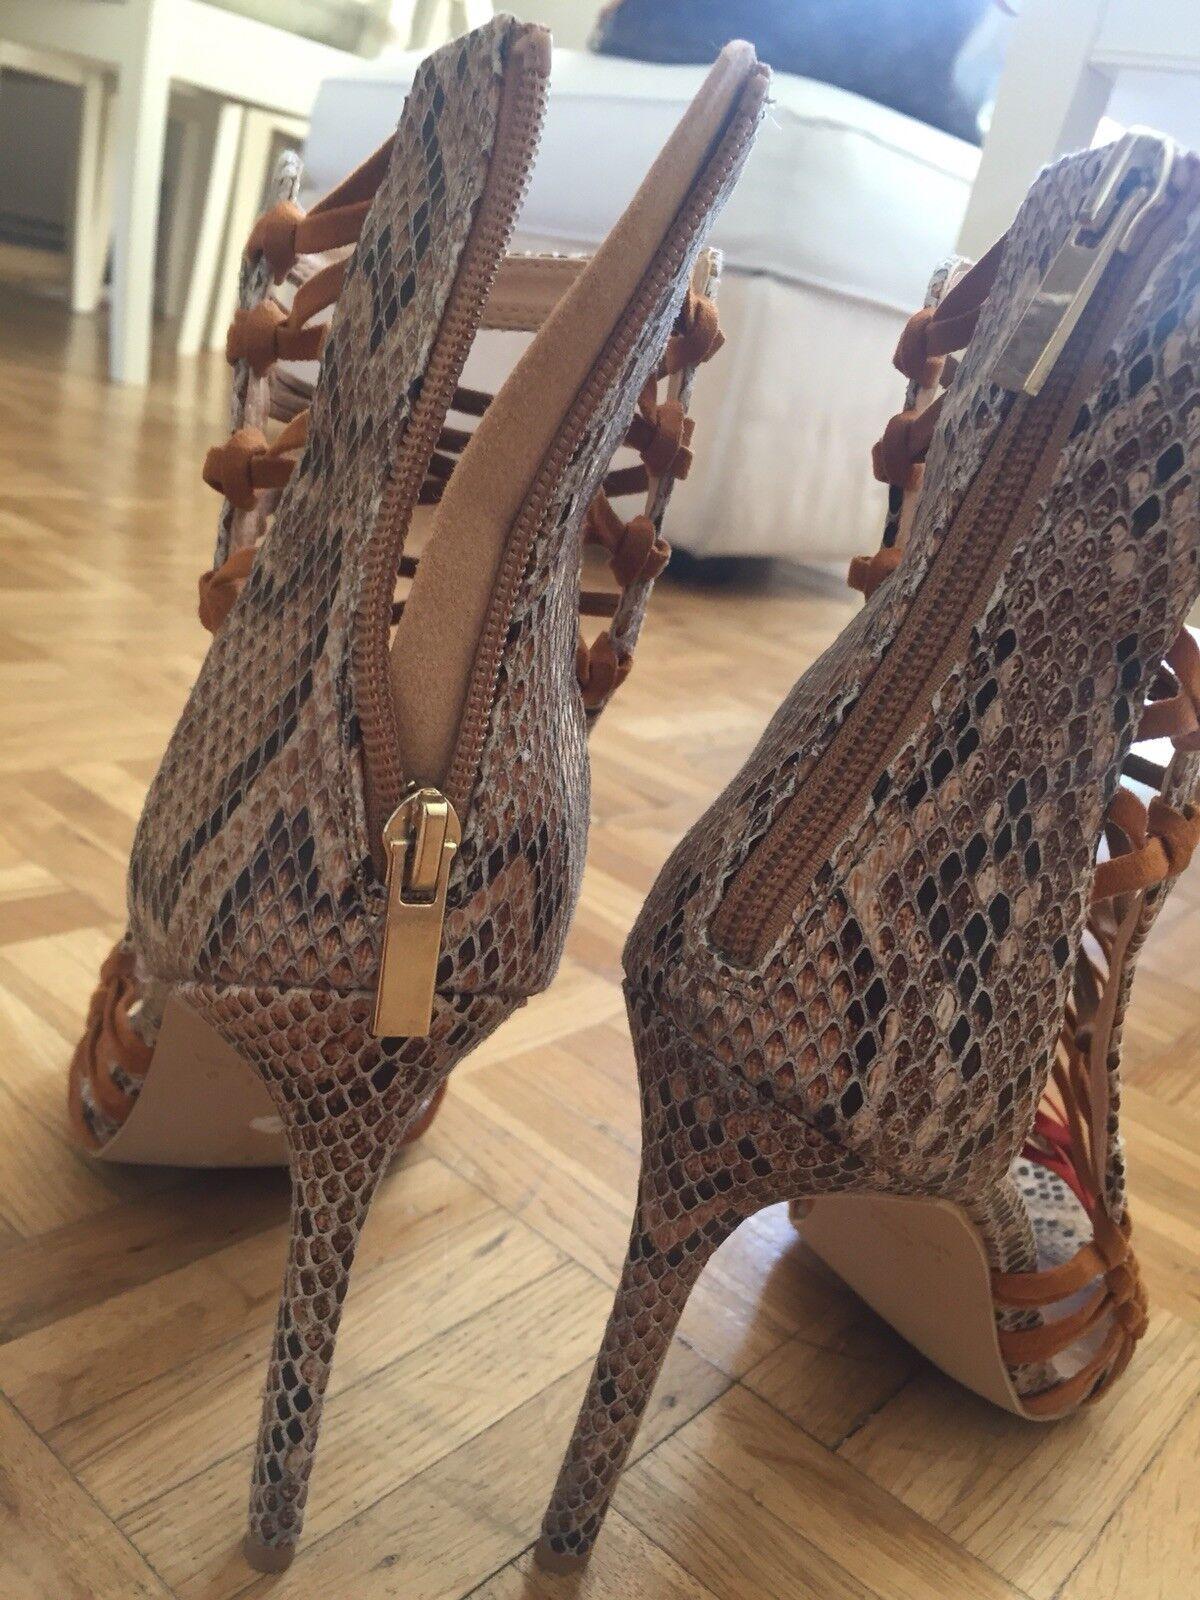 Reptil Lace Up High Heels Gr. 41 Blogger Gladiator Heels Heels Heels Animal Print b02cea